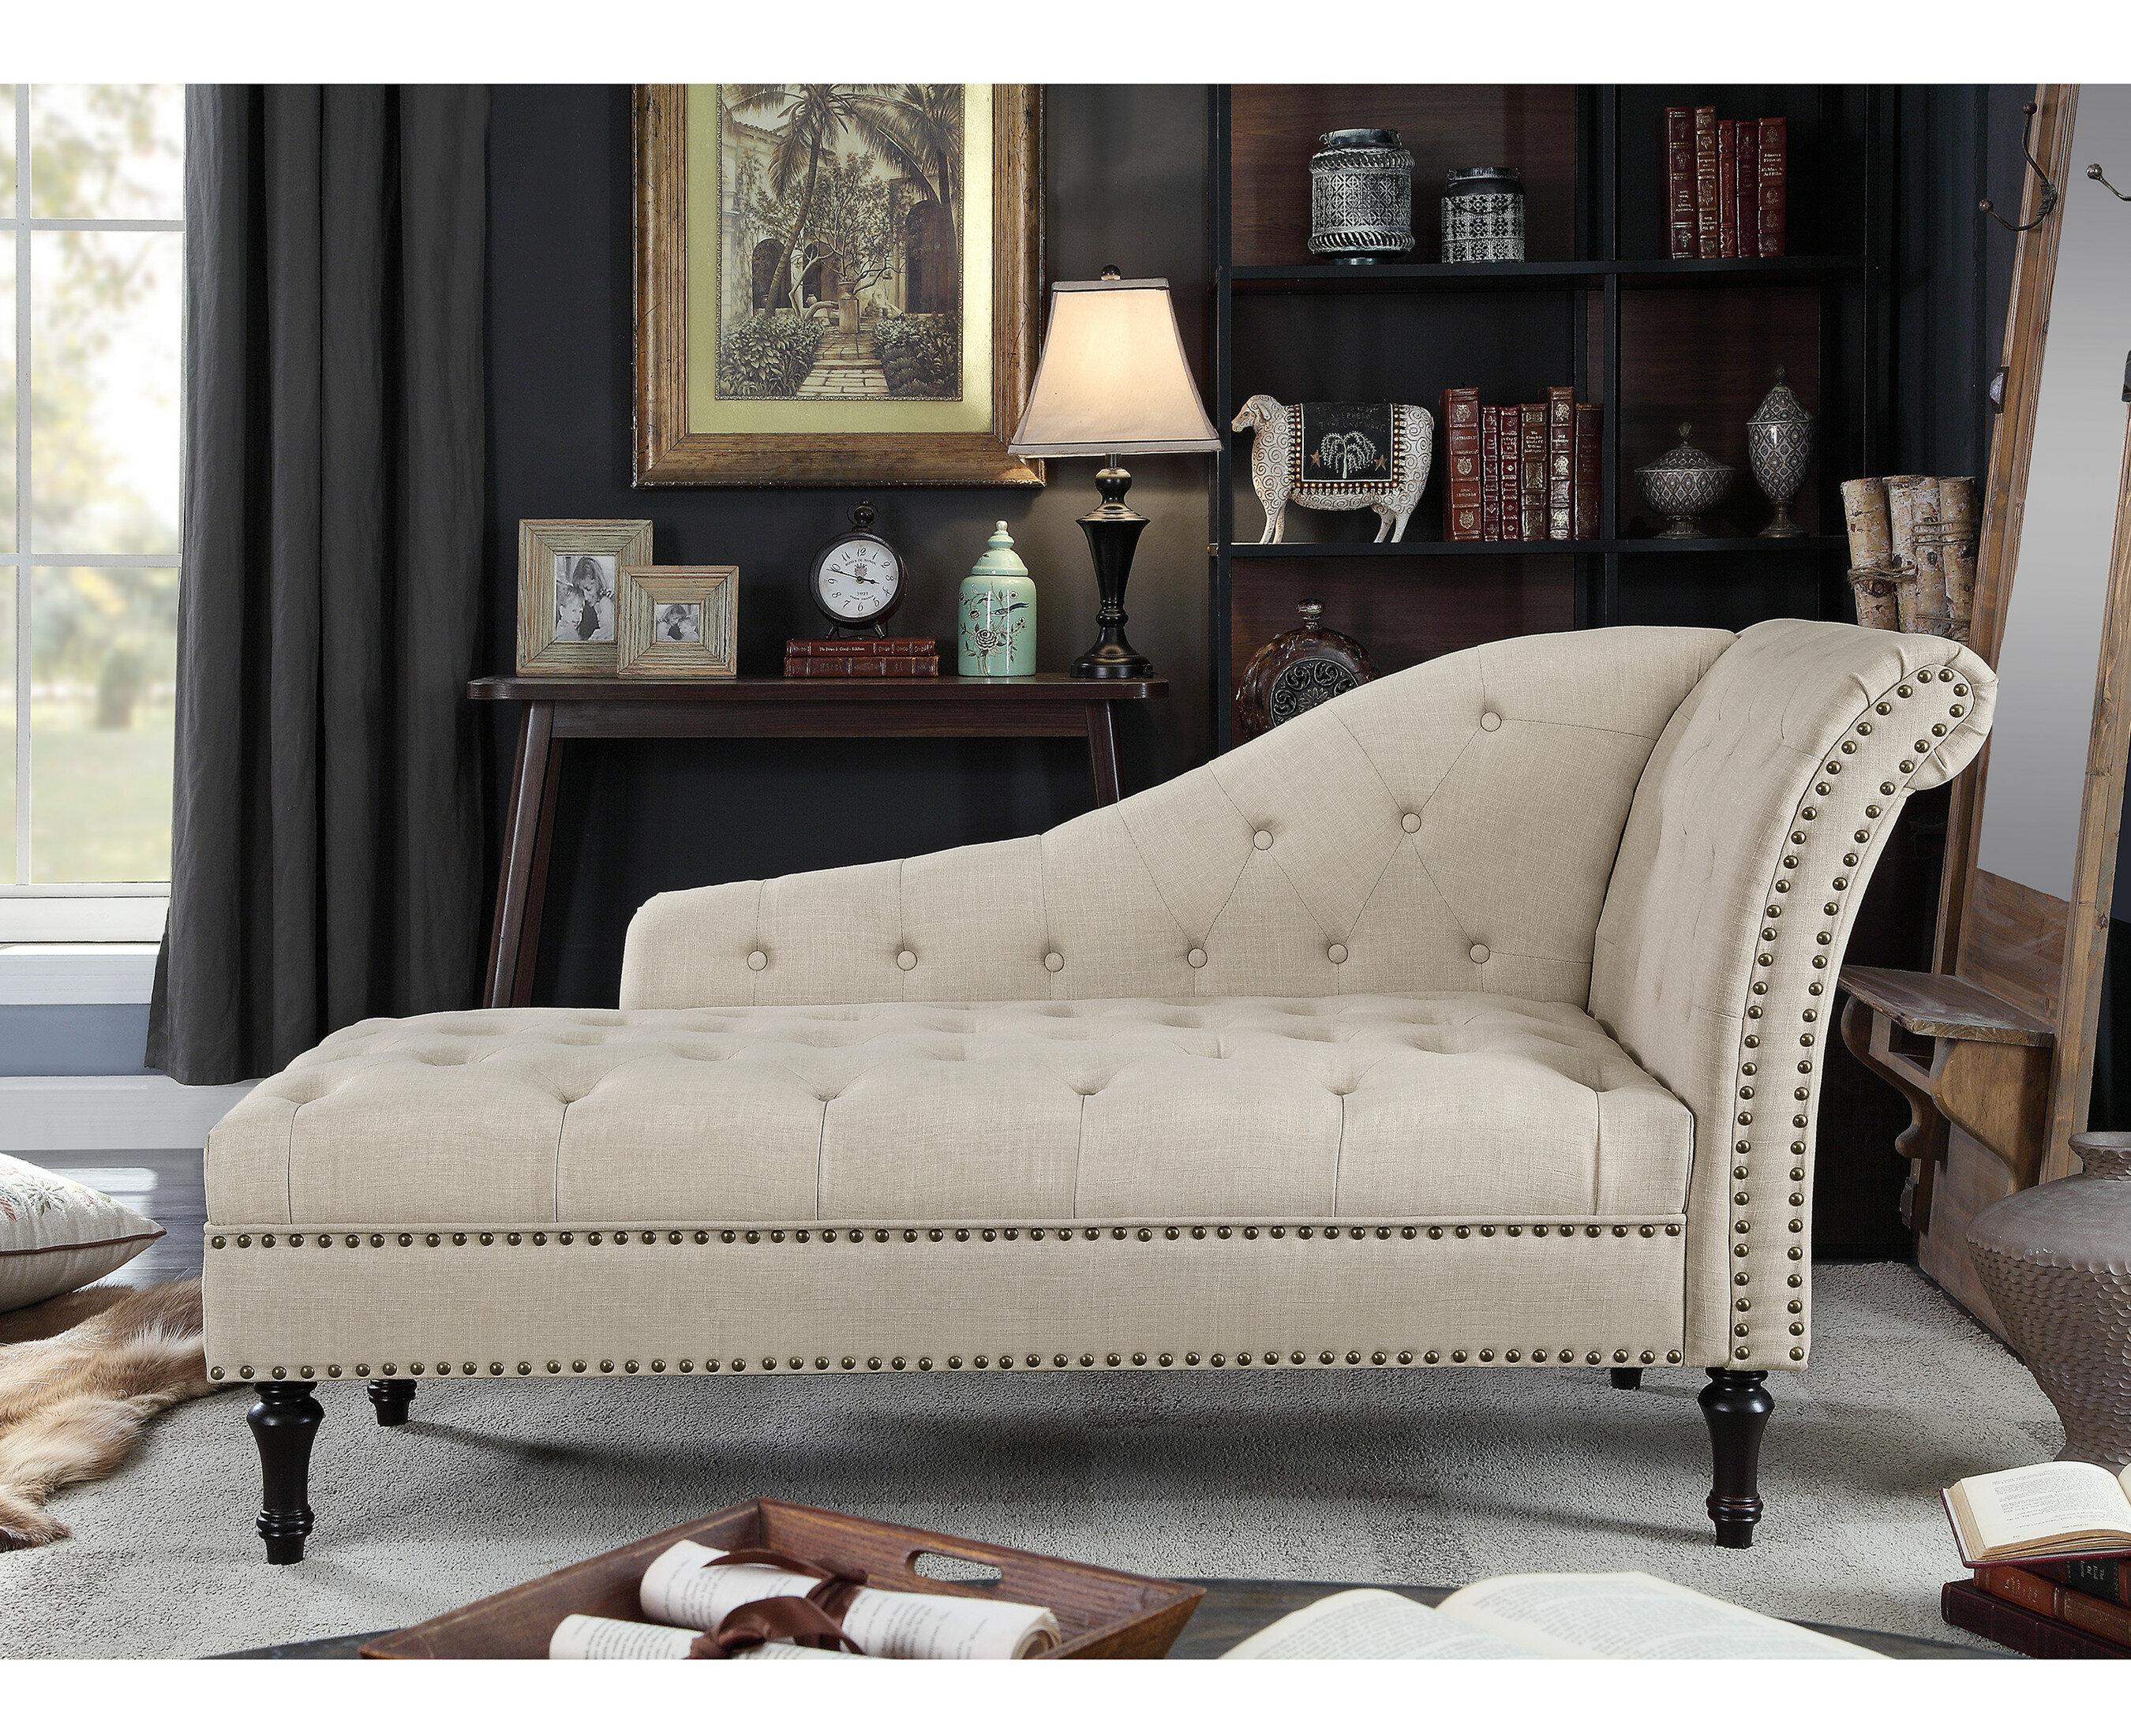 Darby Home Co Deedee Chaise Lounge & Reviews | Wayfair